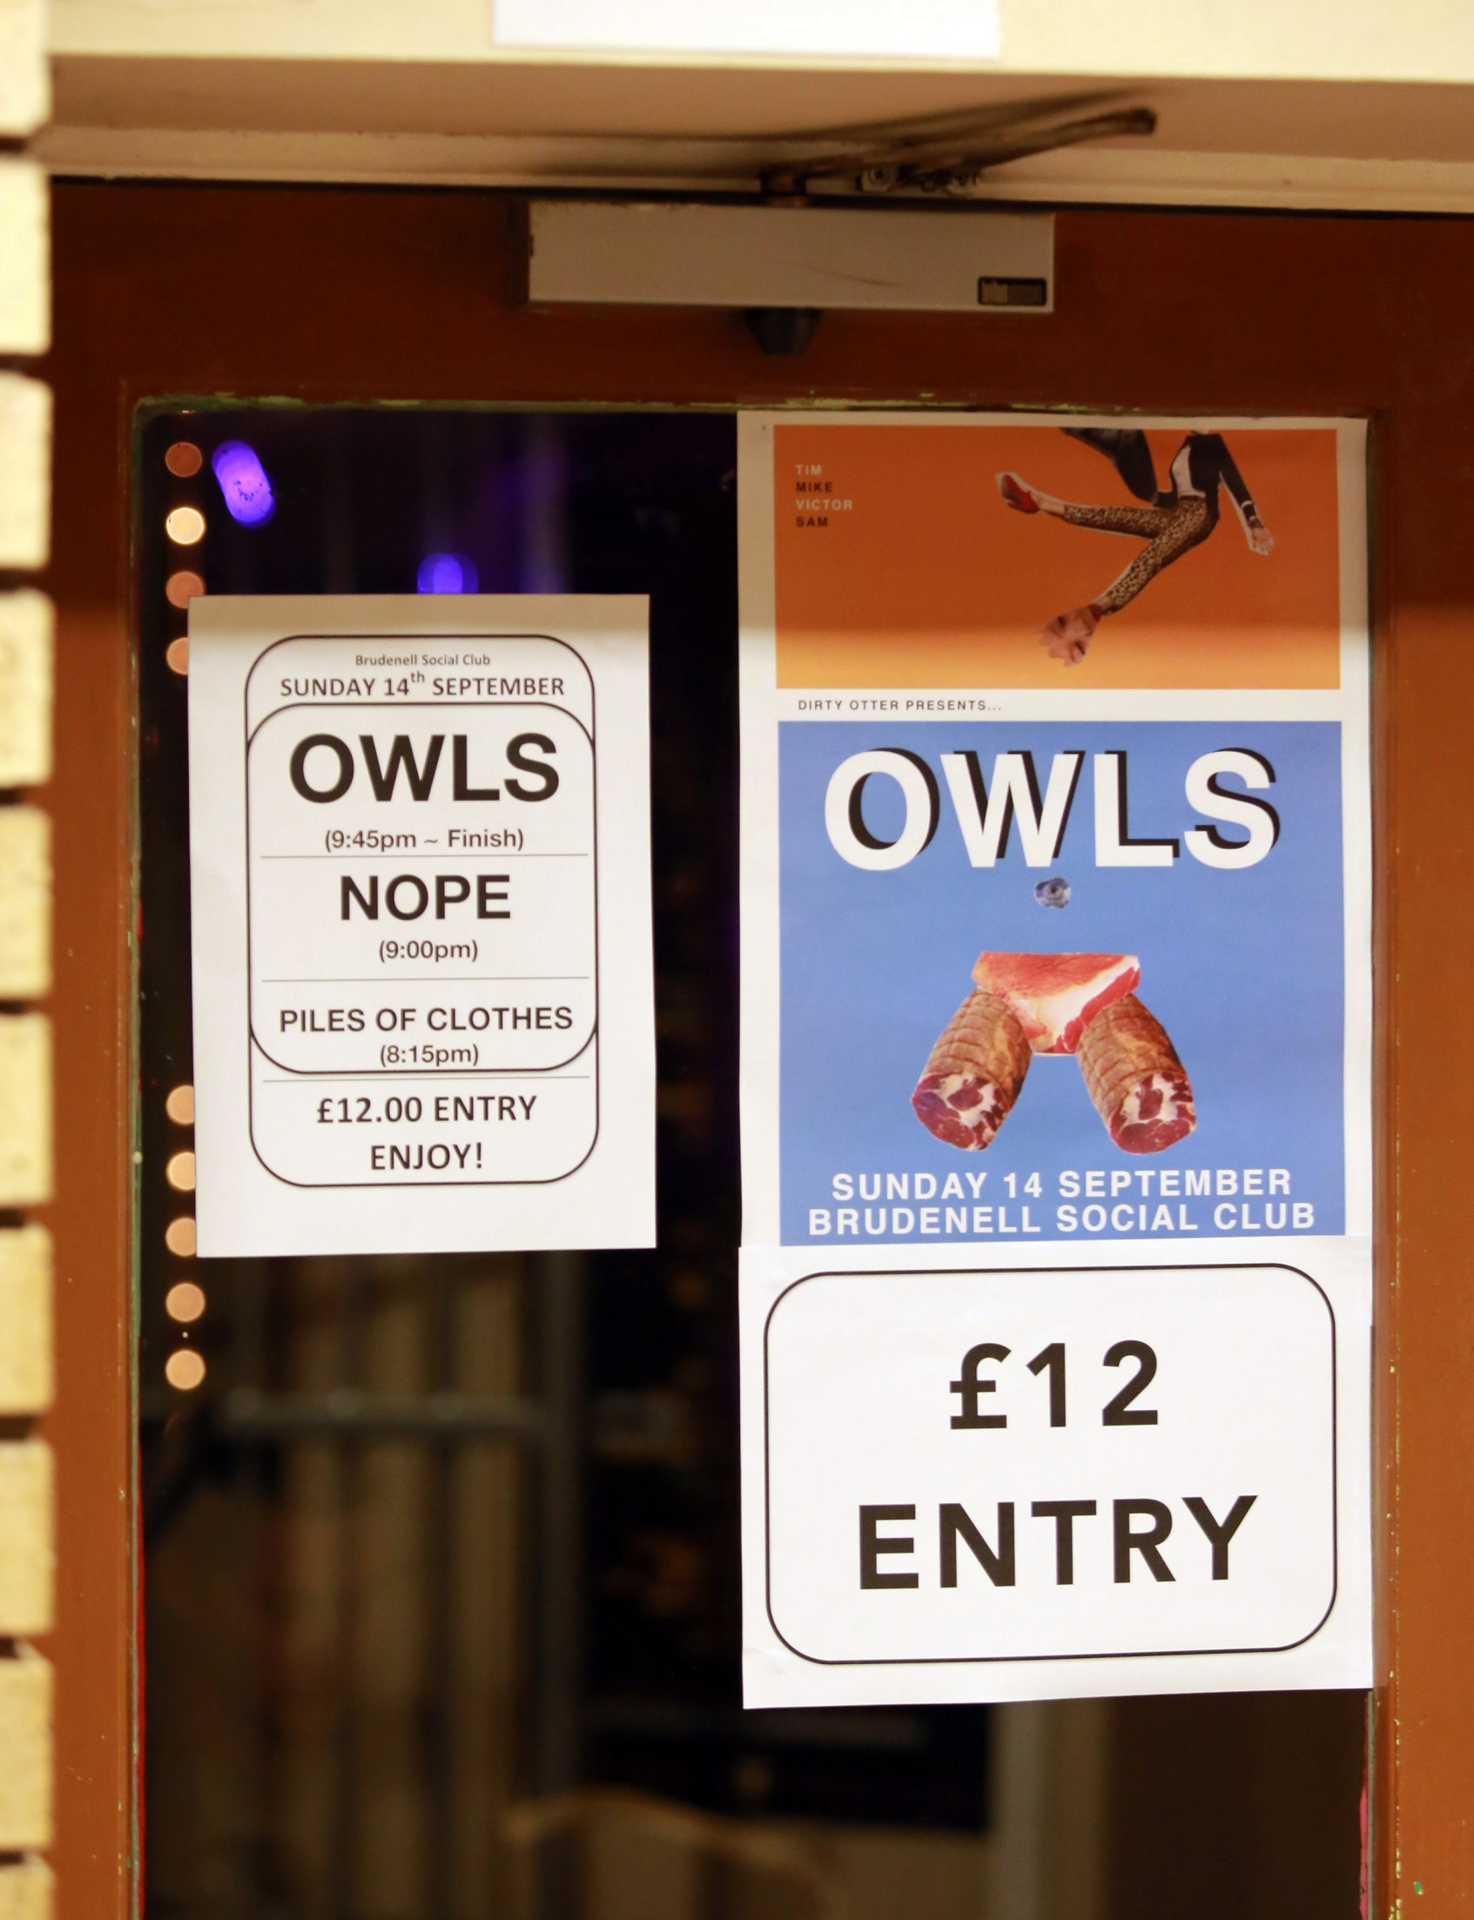 Owls & Nope – Brudenell Social Club, Leeds, 14th September 2014